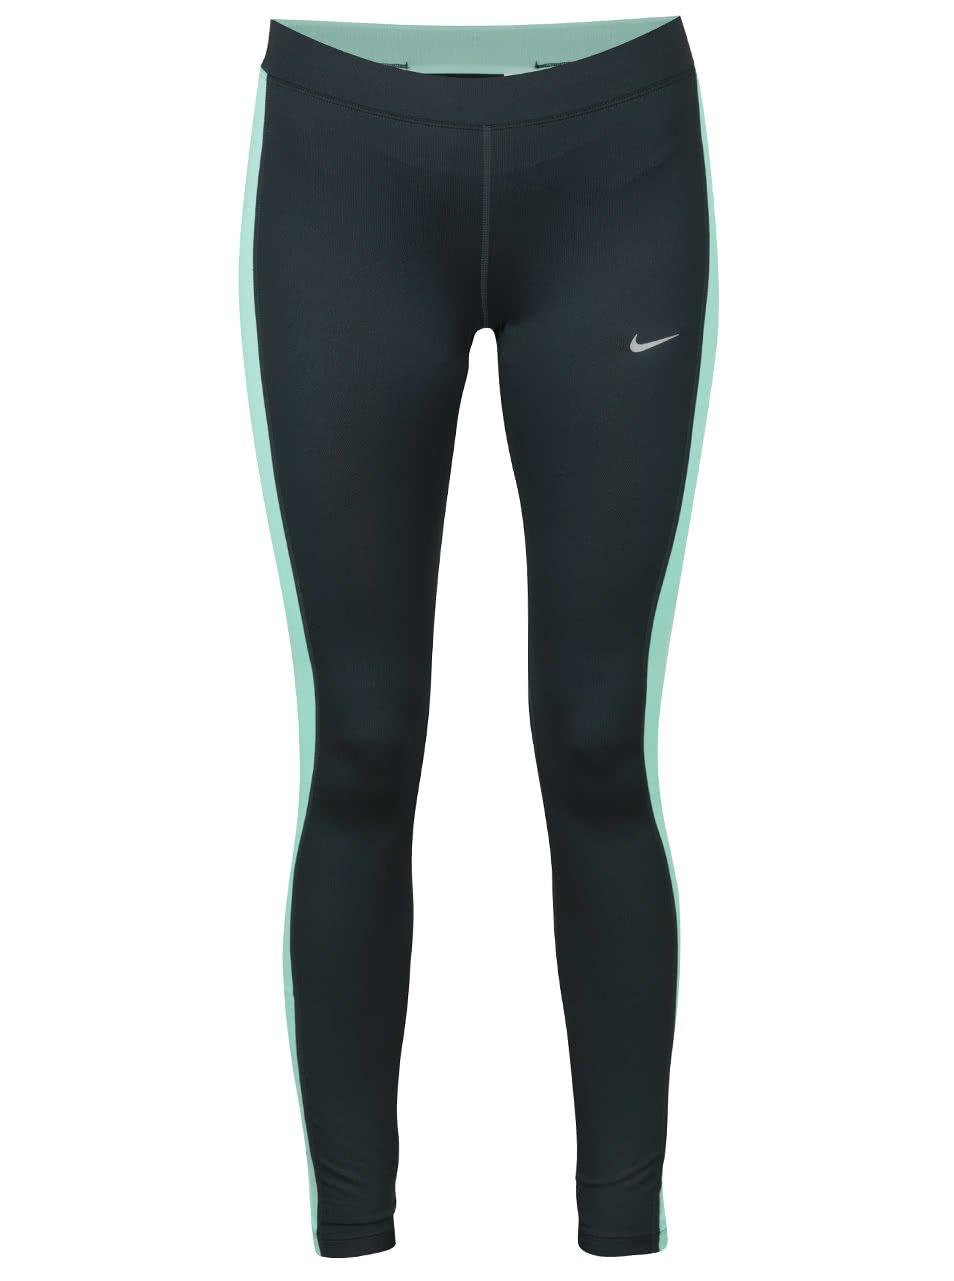 Zelené dámské legíny Nike International